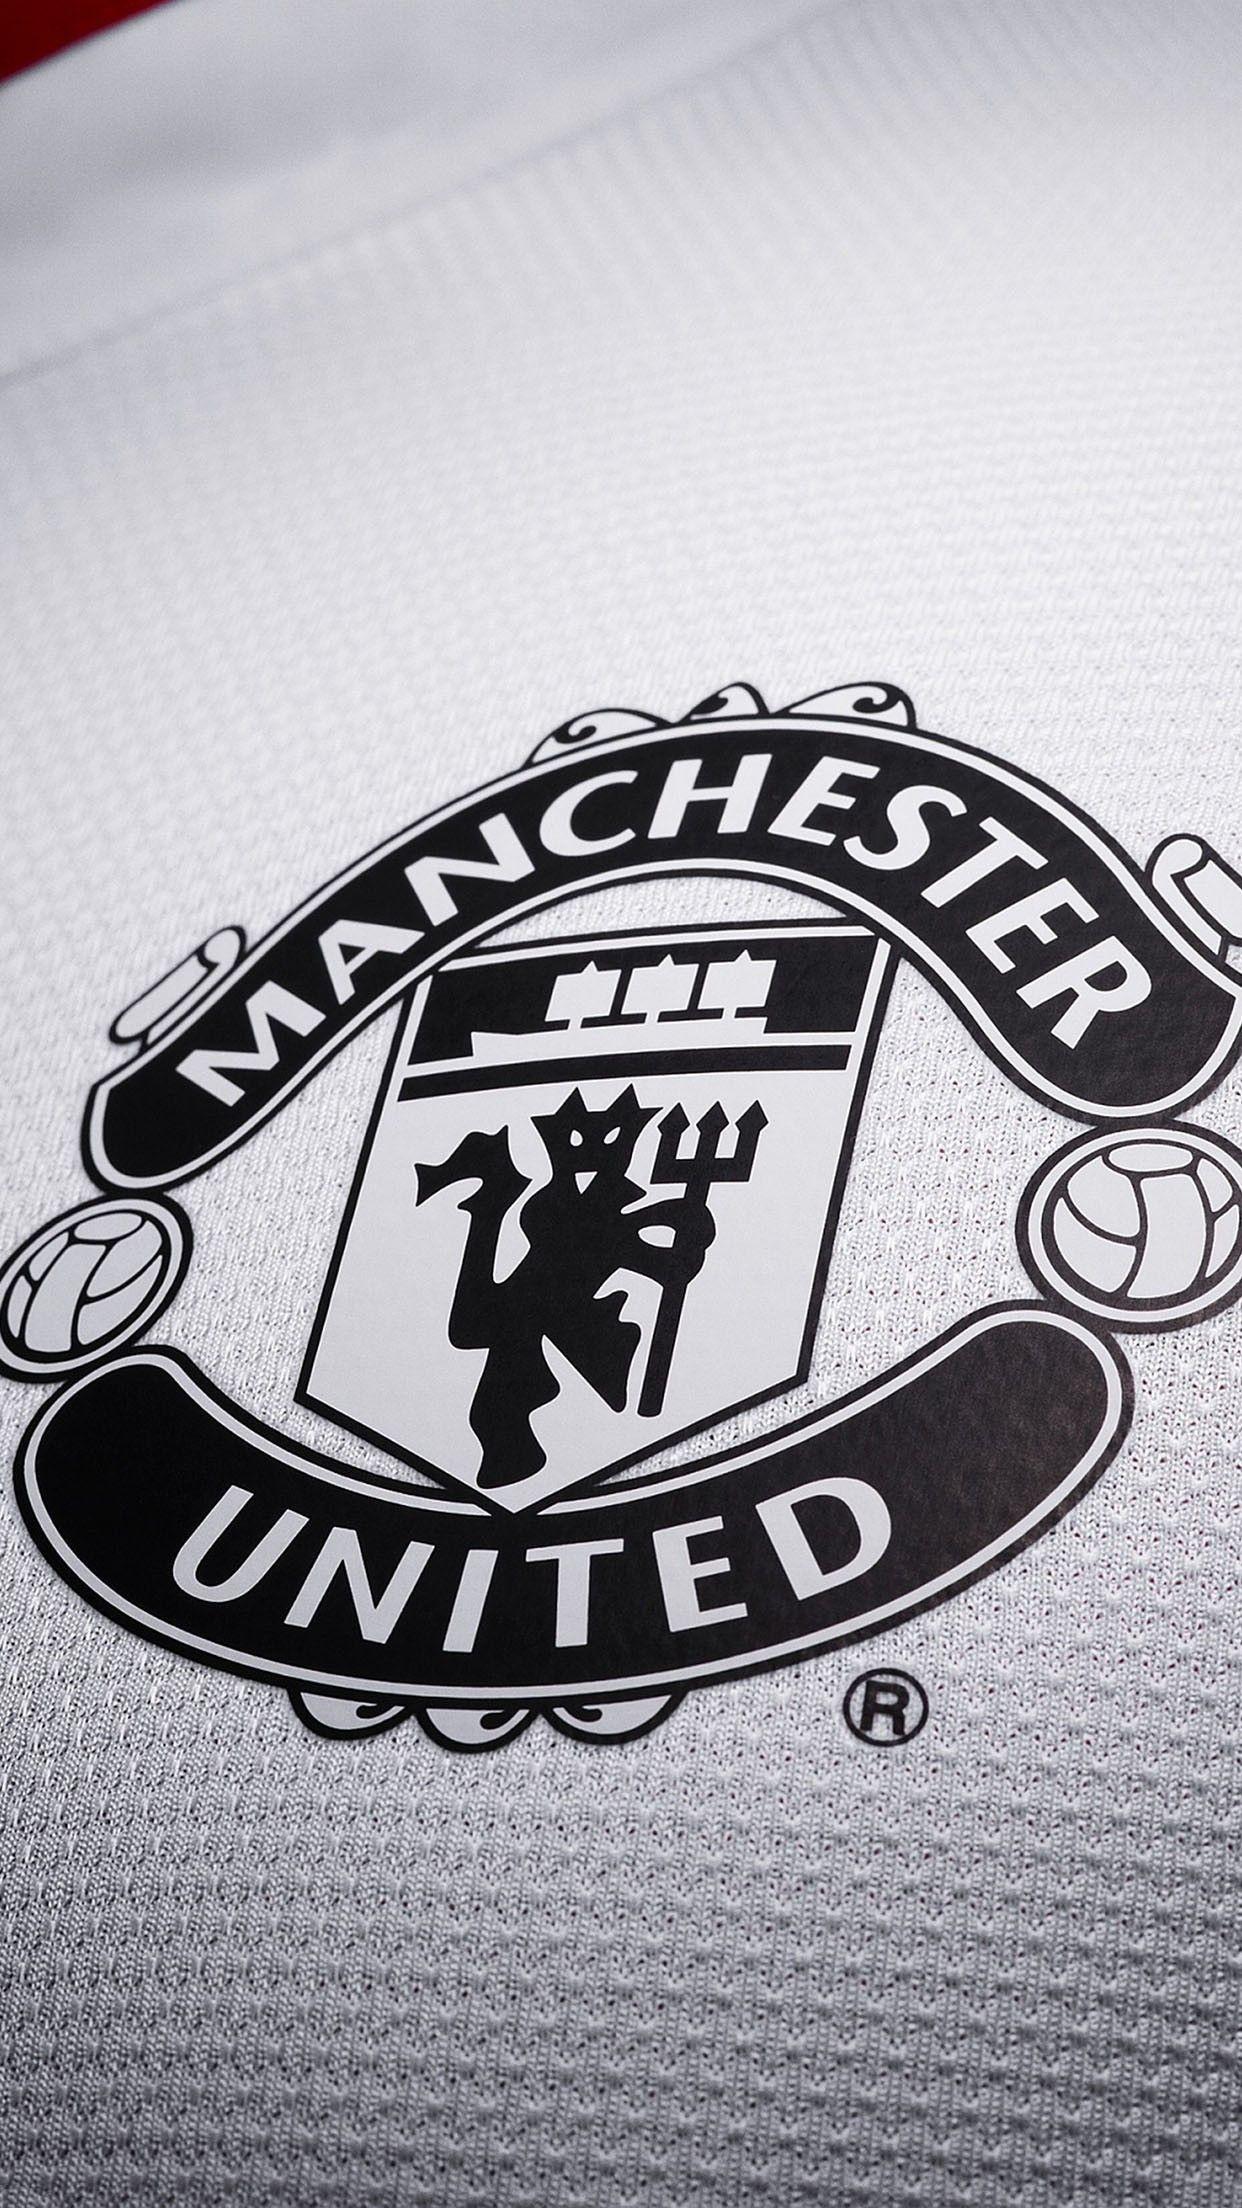 Manchester United Uniform Logo Black White Smartphone Wallpaper And Lockscreen Hd Manchester United Wallpaper Manchester United Logo Manchester United